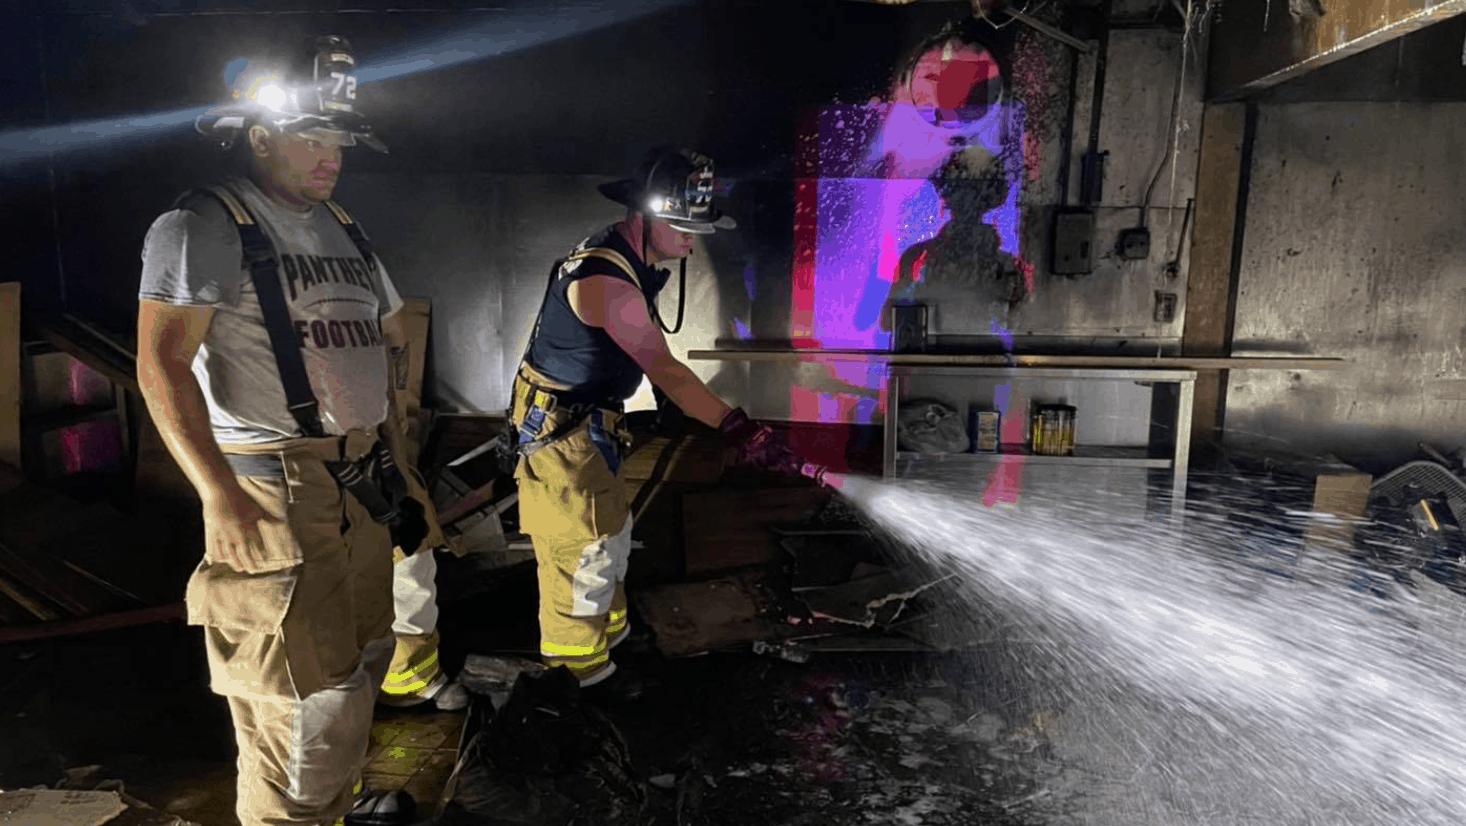 Rio Grande Restaurant Catches Fire